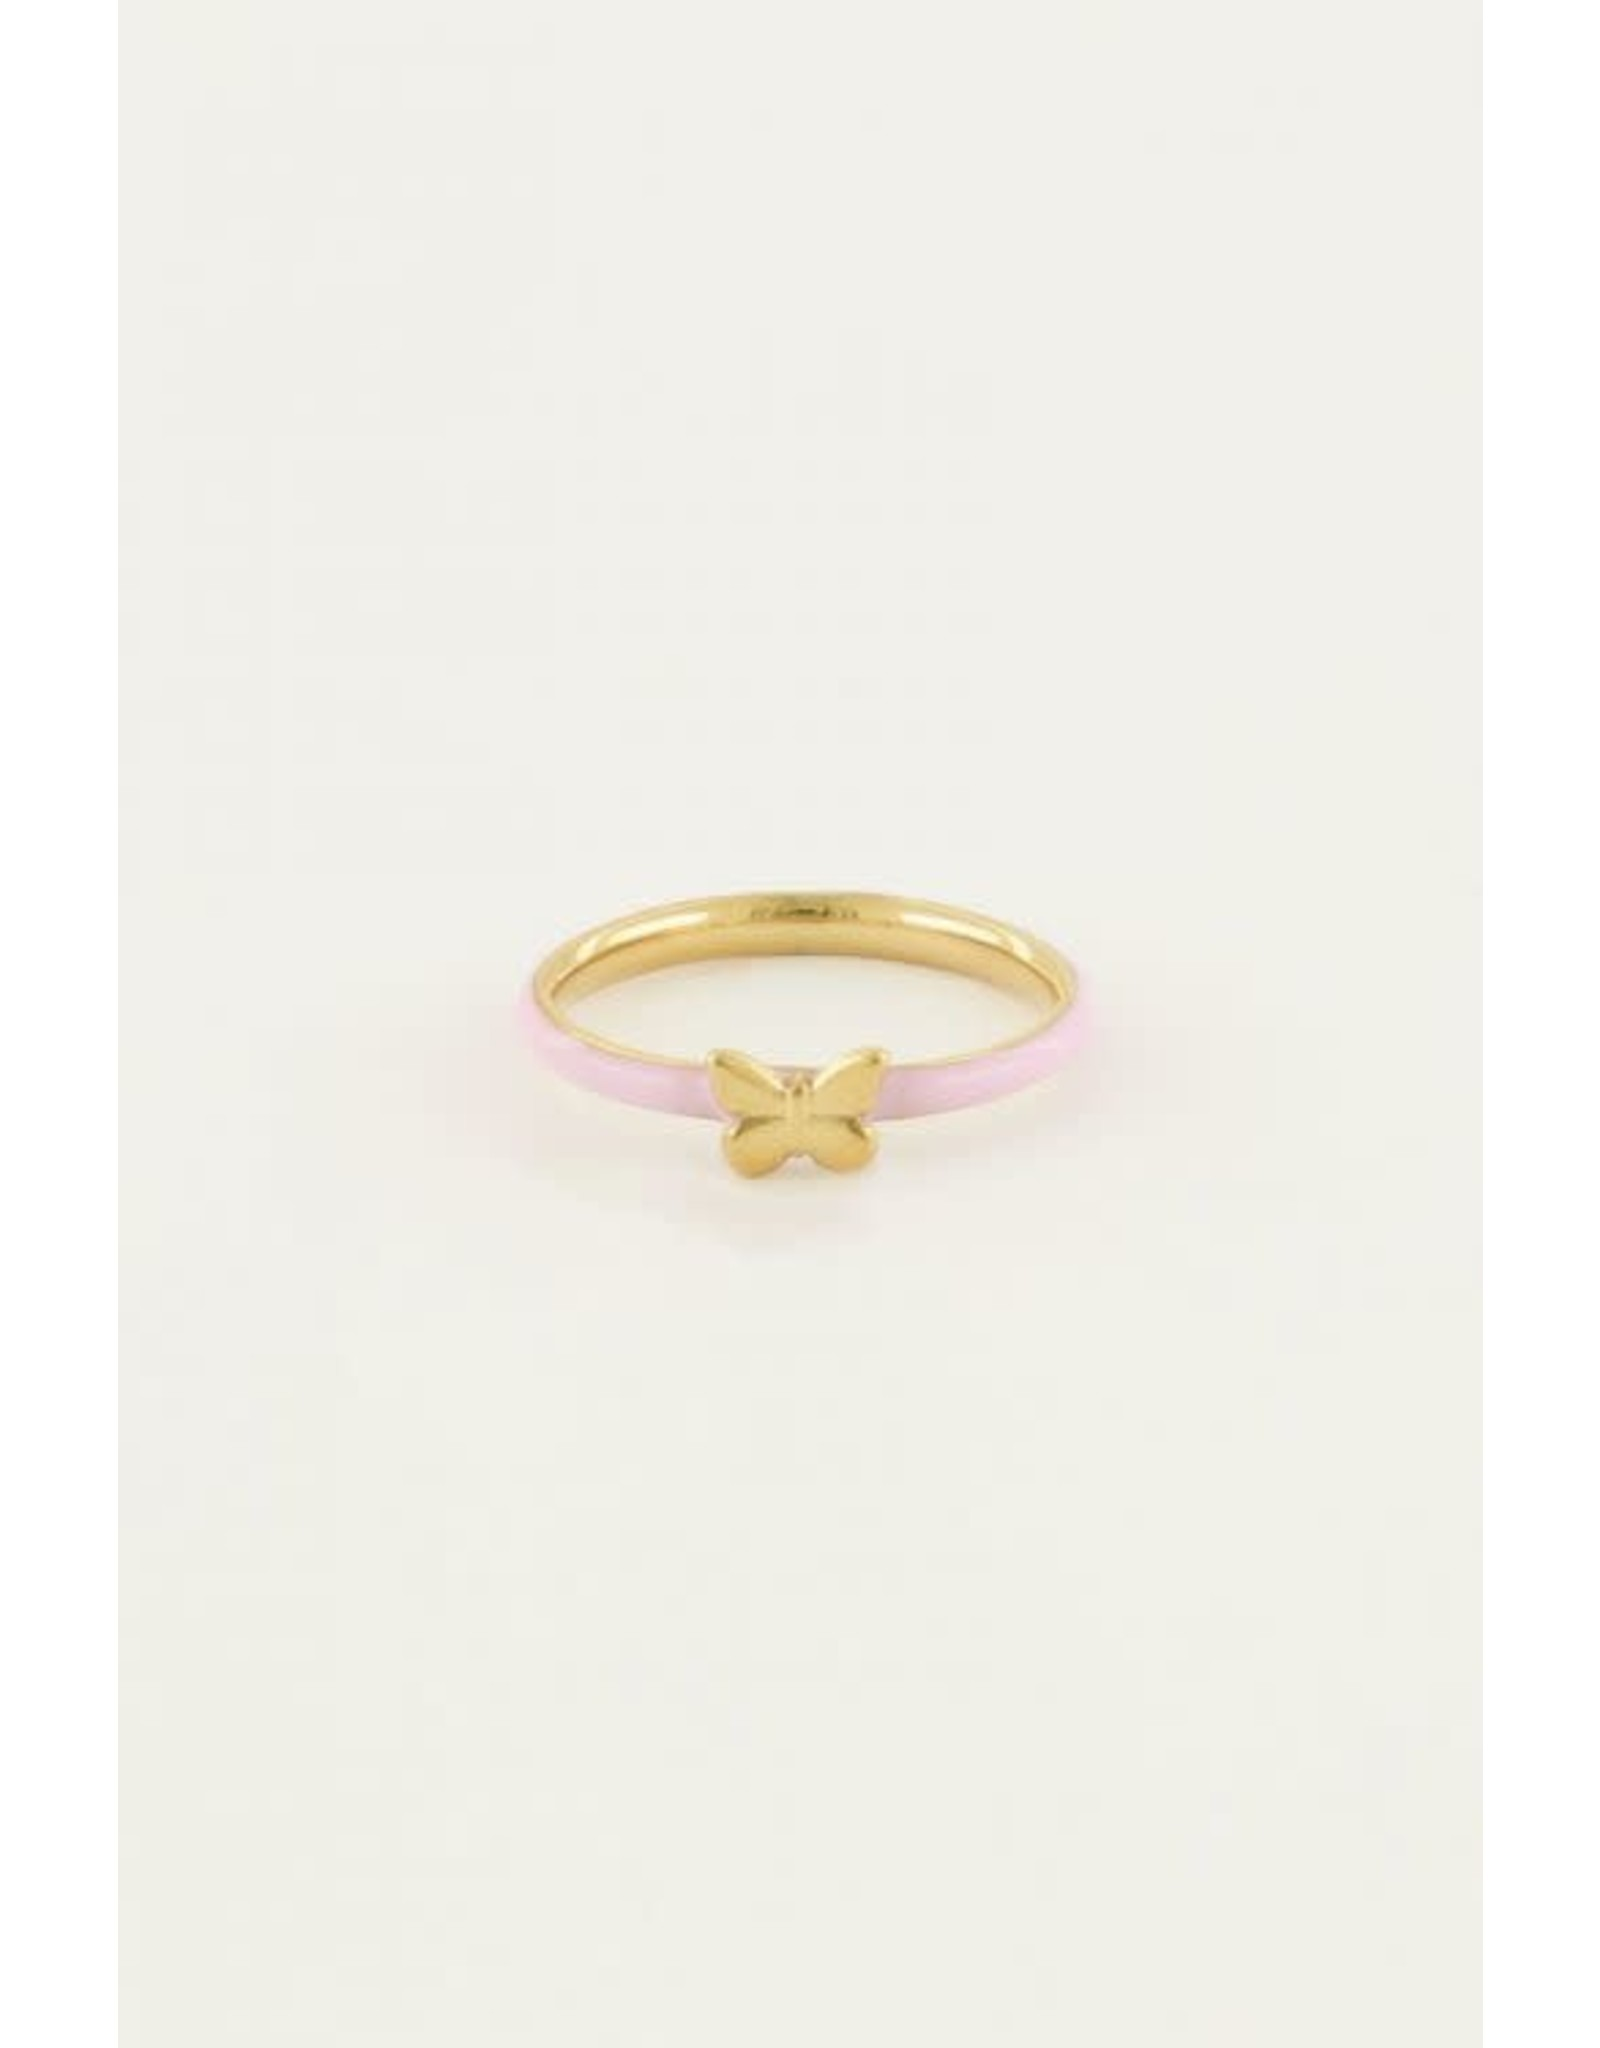 My Jewellery My Jewellery ring roze vlinder